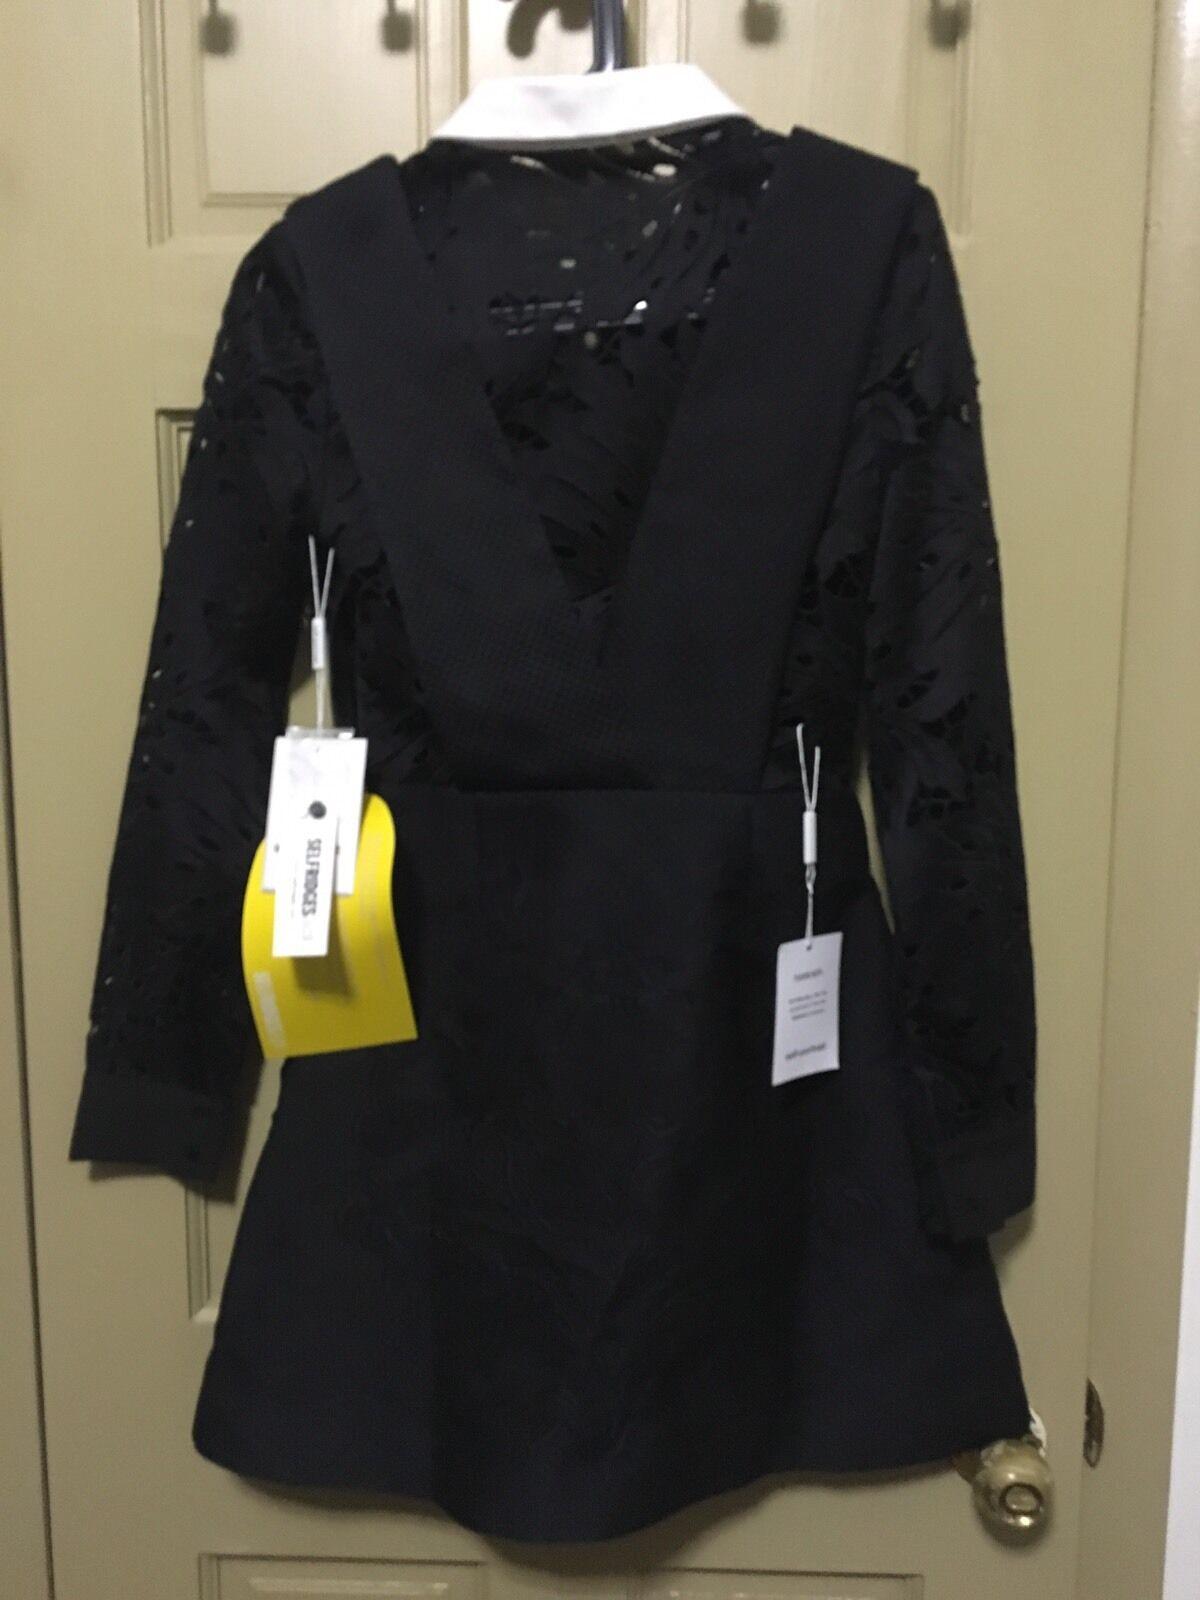 NWT Self-Portrait Botanical Guipure-Lace Quilted Dress Dress Dress US 2 53d52a